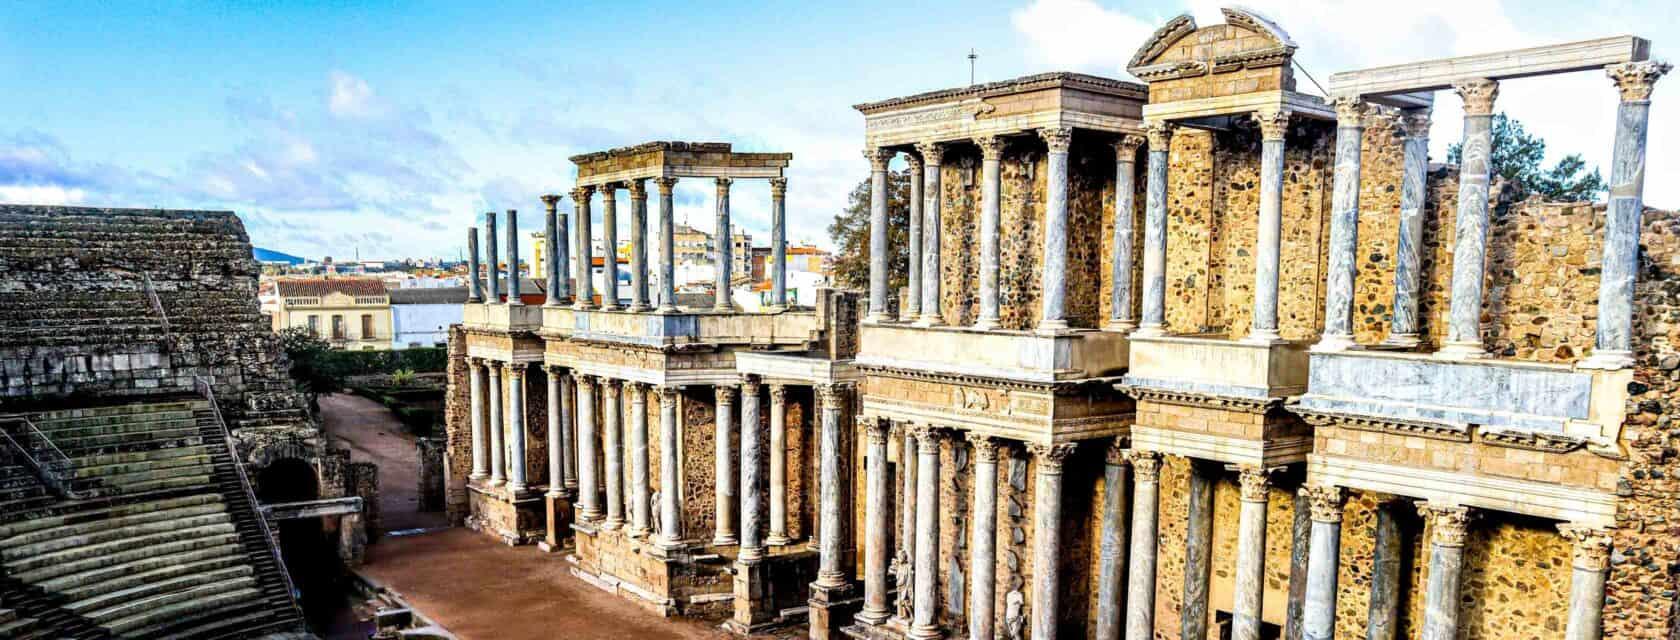 Roman architecture in the city of Merida.